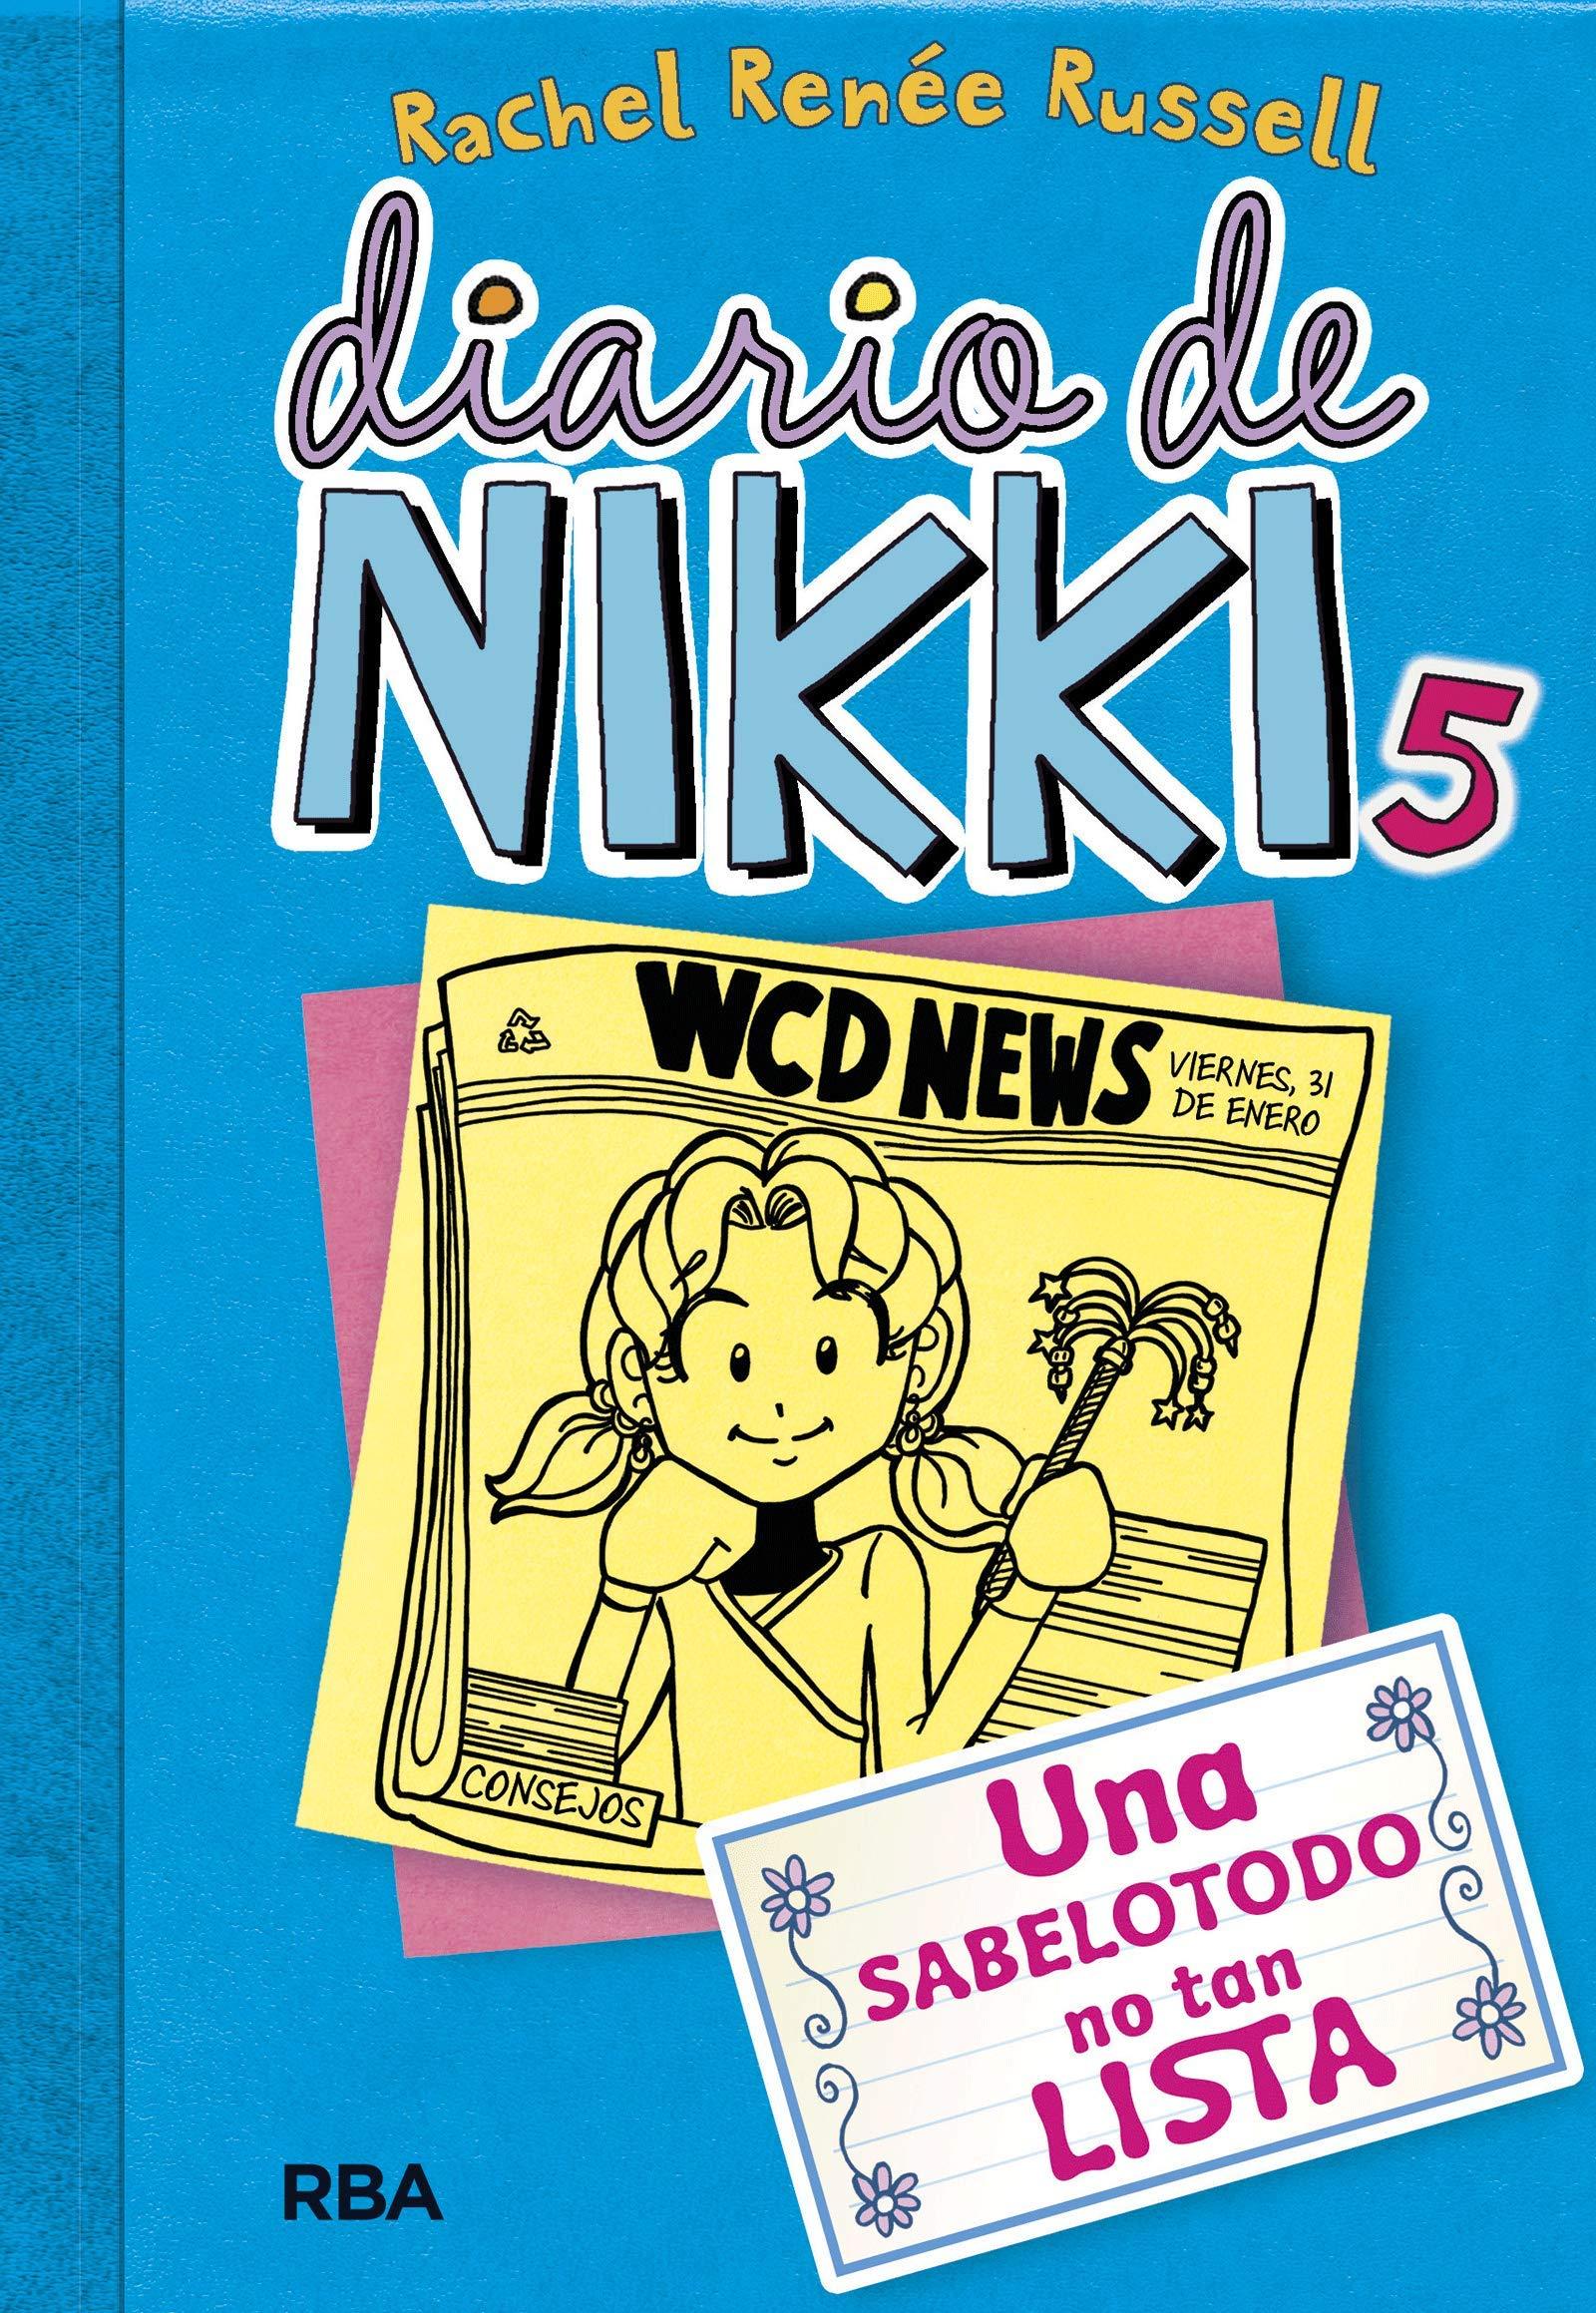 Diario De Nikki 5 Una Sabelotodo No Tan Lista Una Sabelotodo No Tan Lista Spanish Edition Russell Rachel Rénee Morán Ortíz Esteban 9788427203860 Books